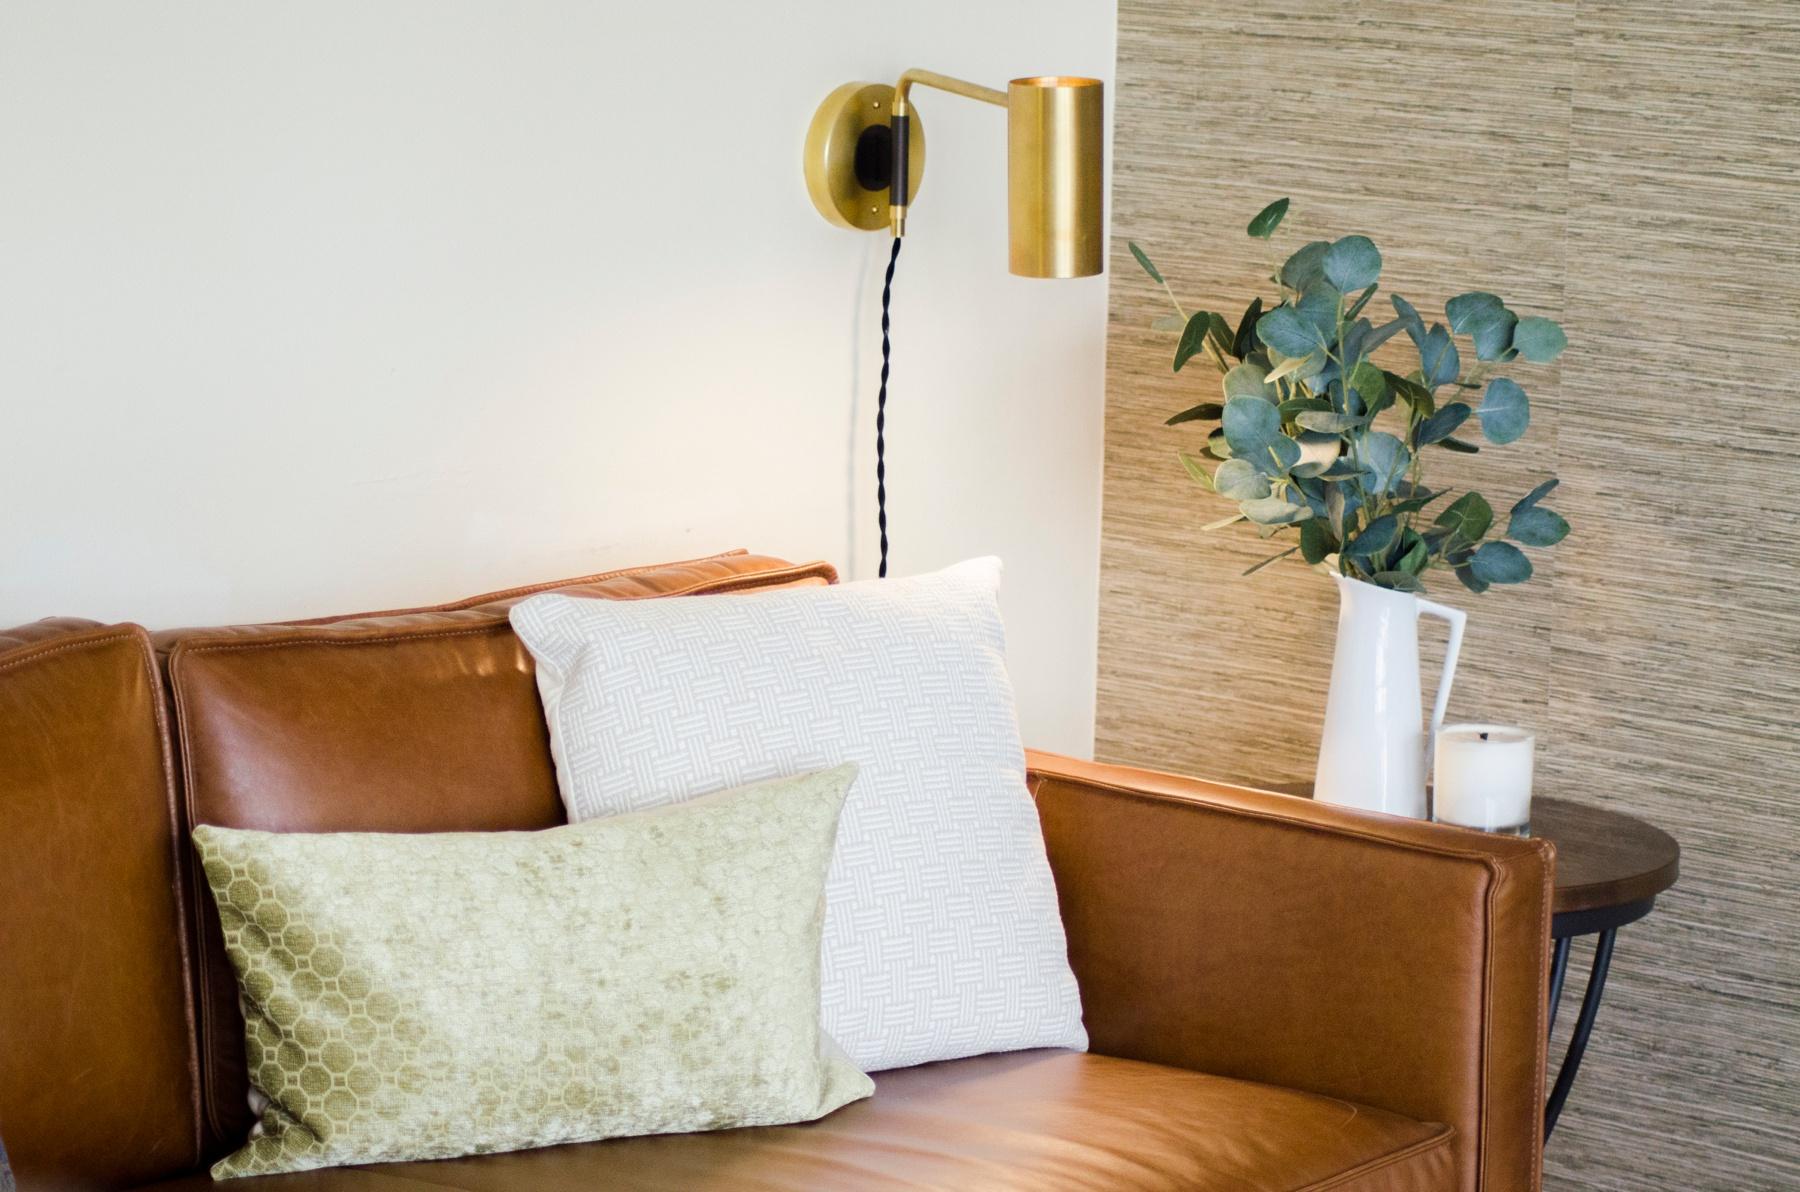 Interior Design Project - VanMell Living Room - Madison, WI -9-1.jpg